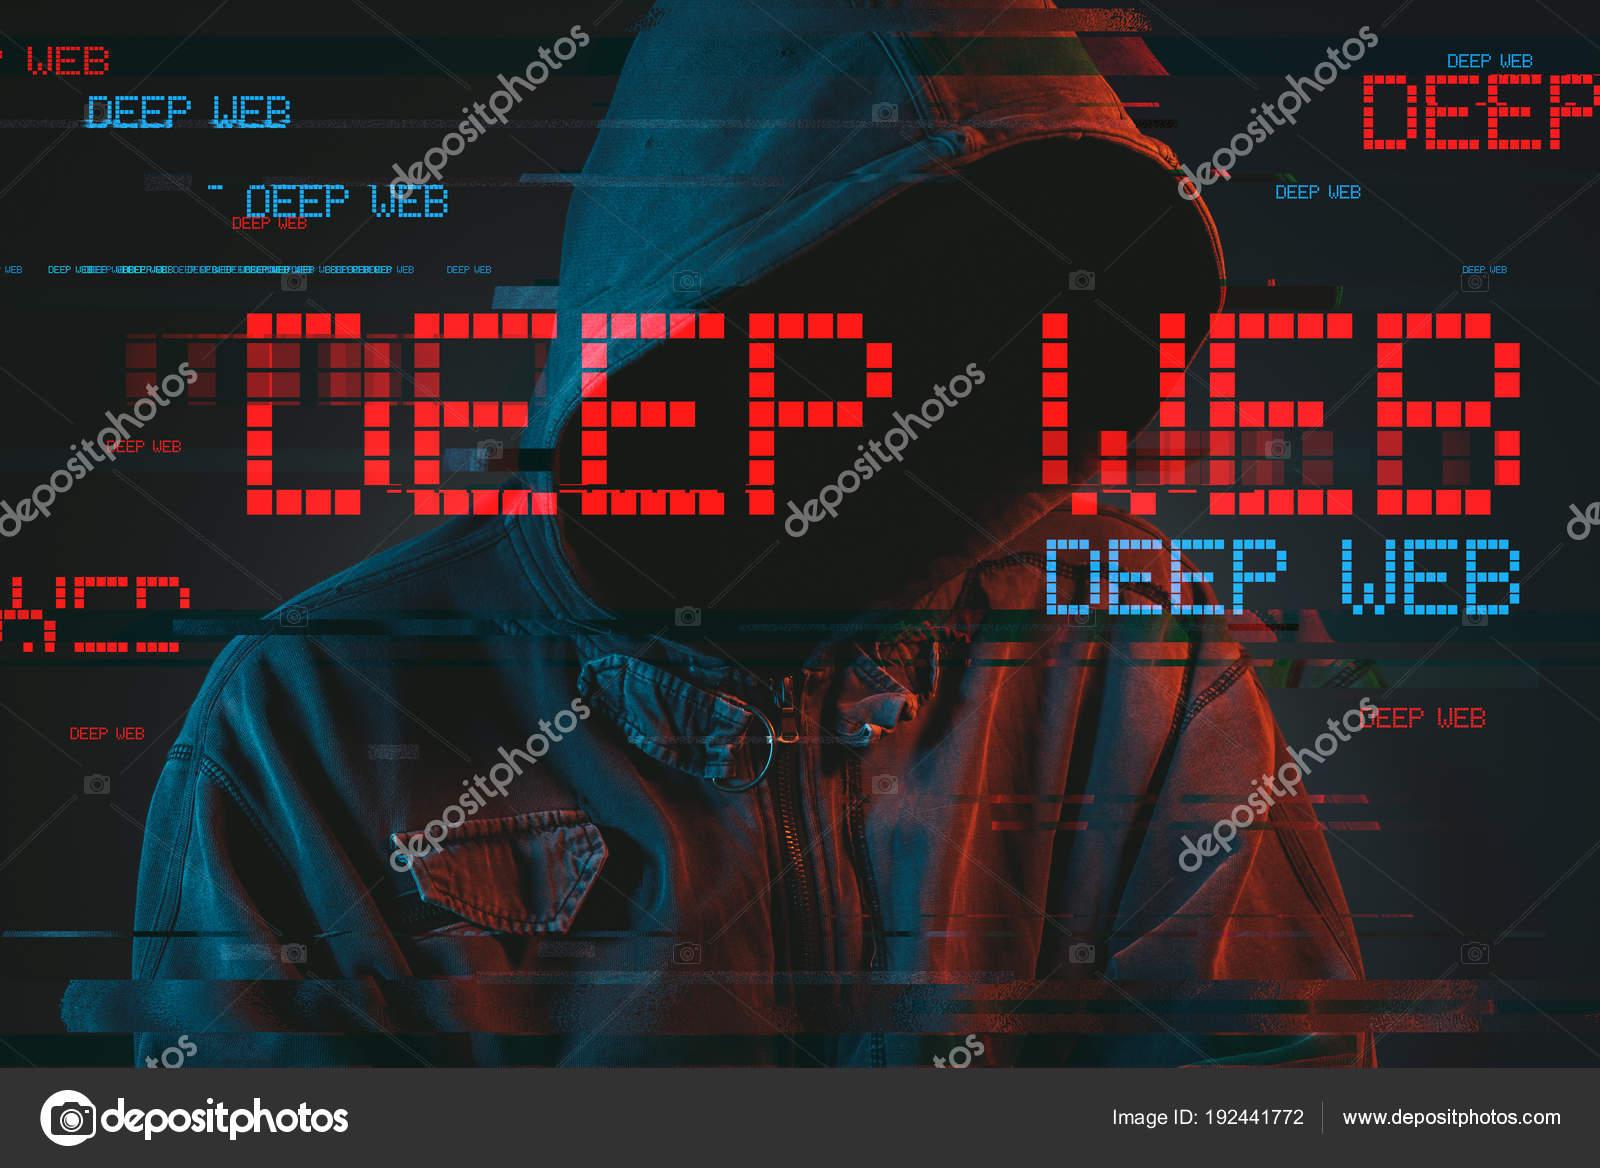 Authoritative deep web sexo think